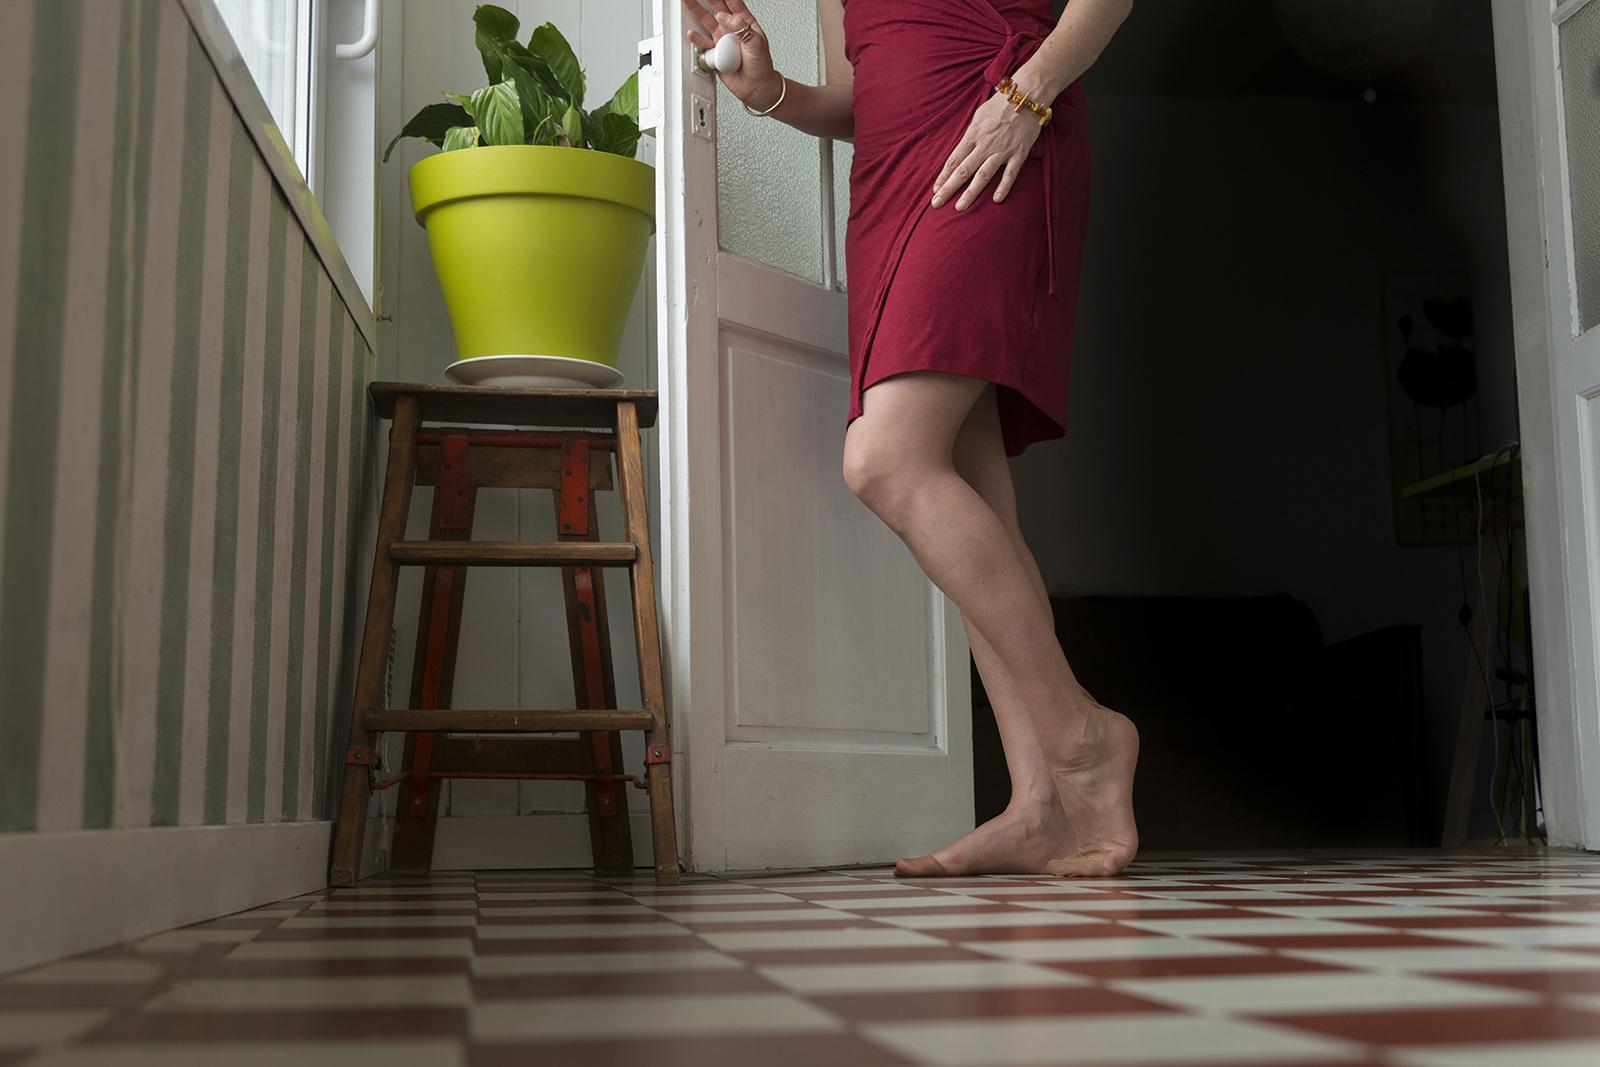 jambes de femme sur carrelage damier